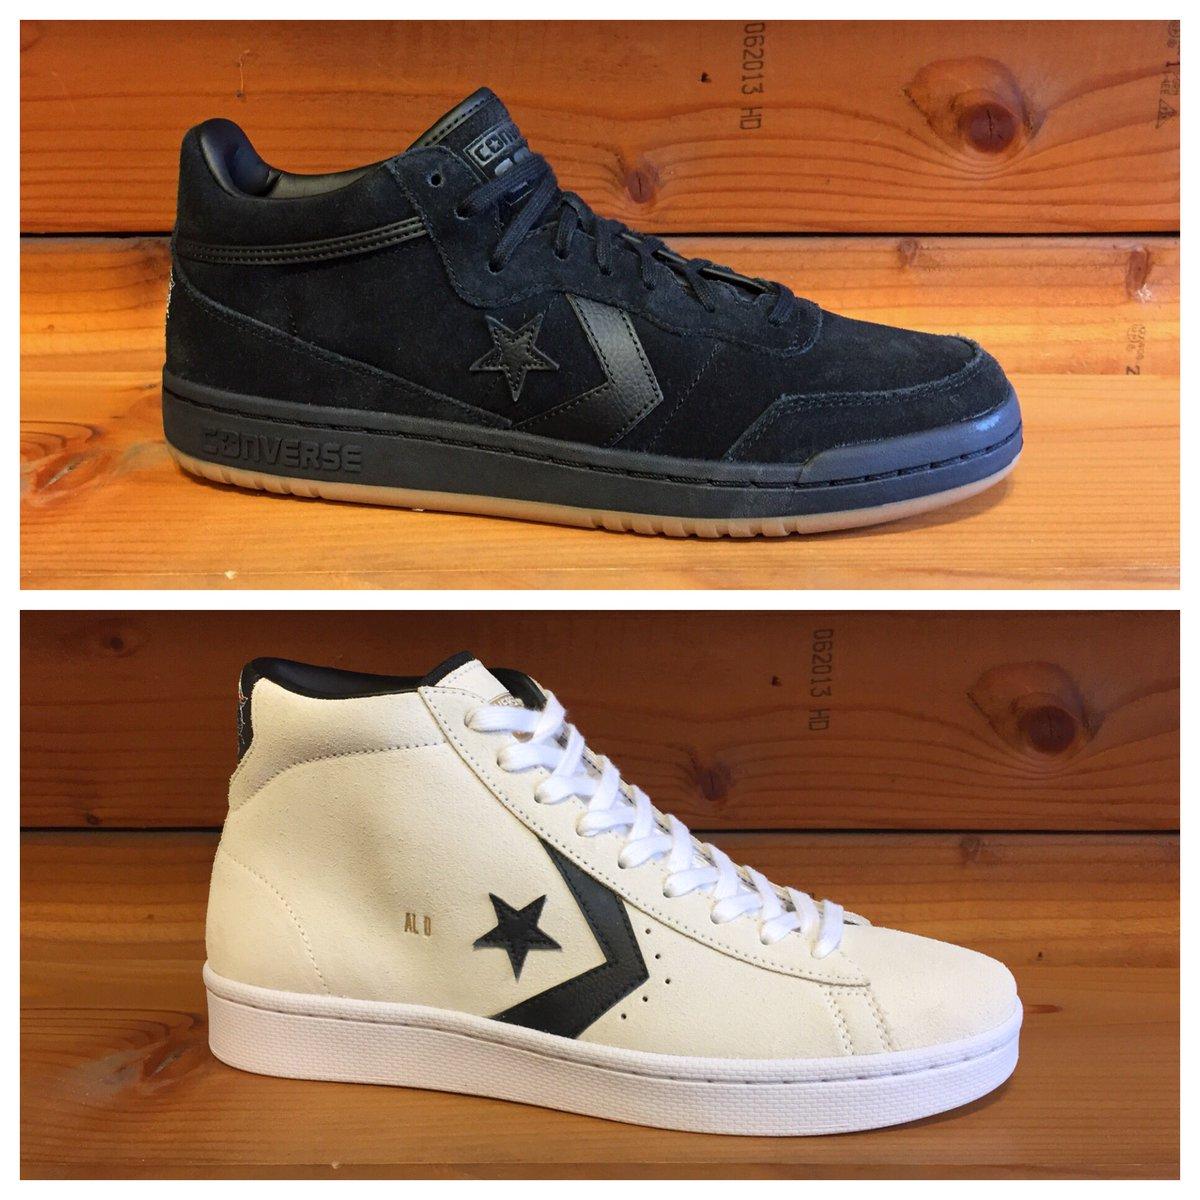 converse fast break pro leather mid